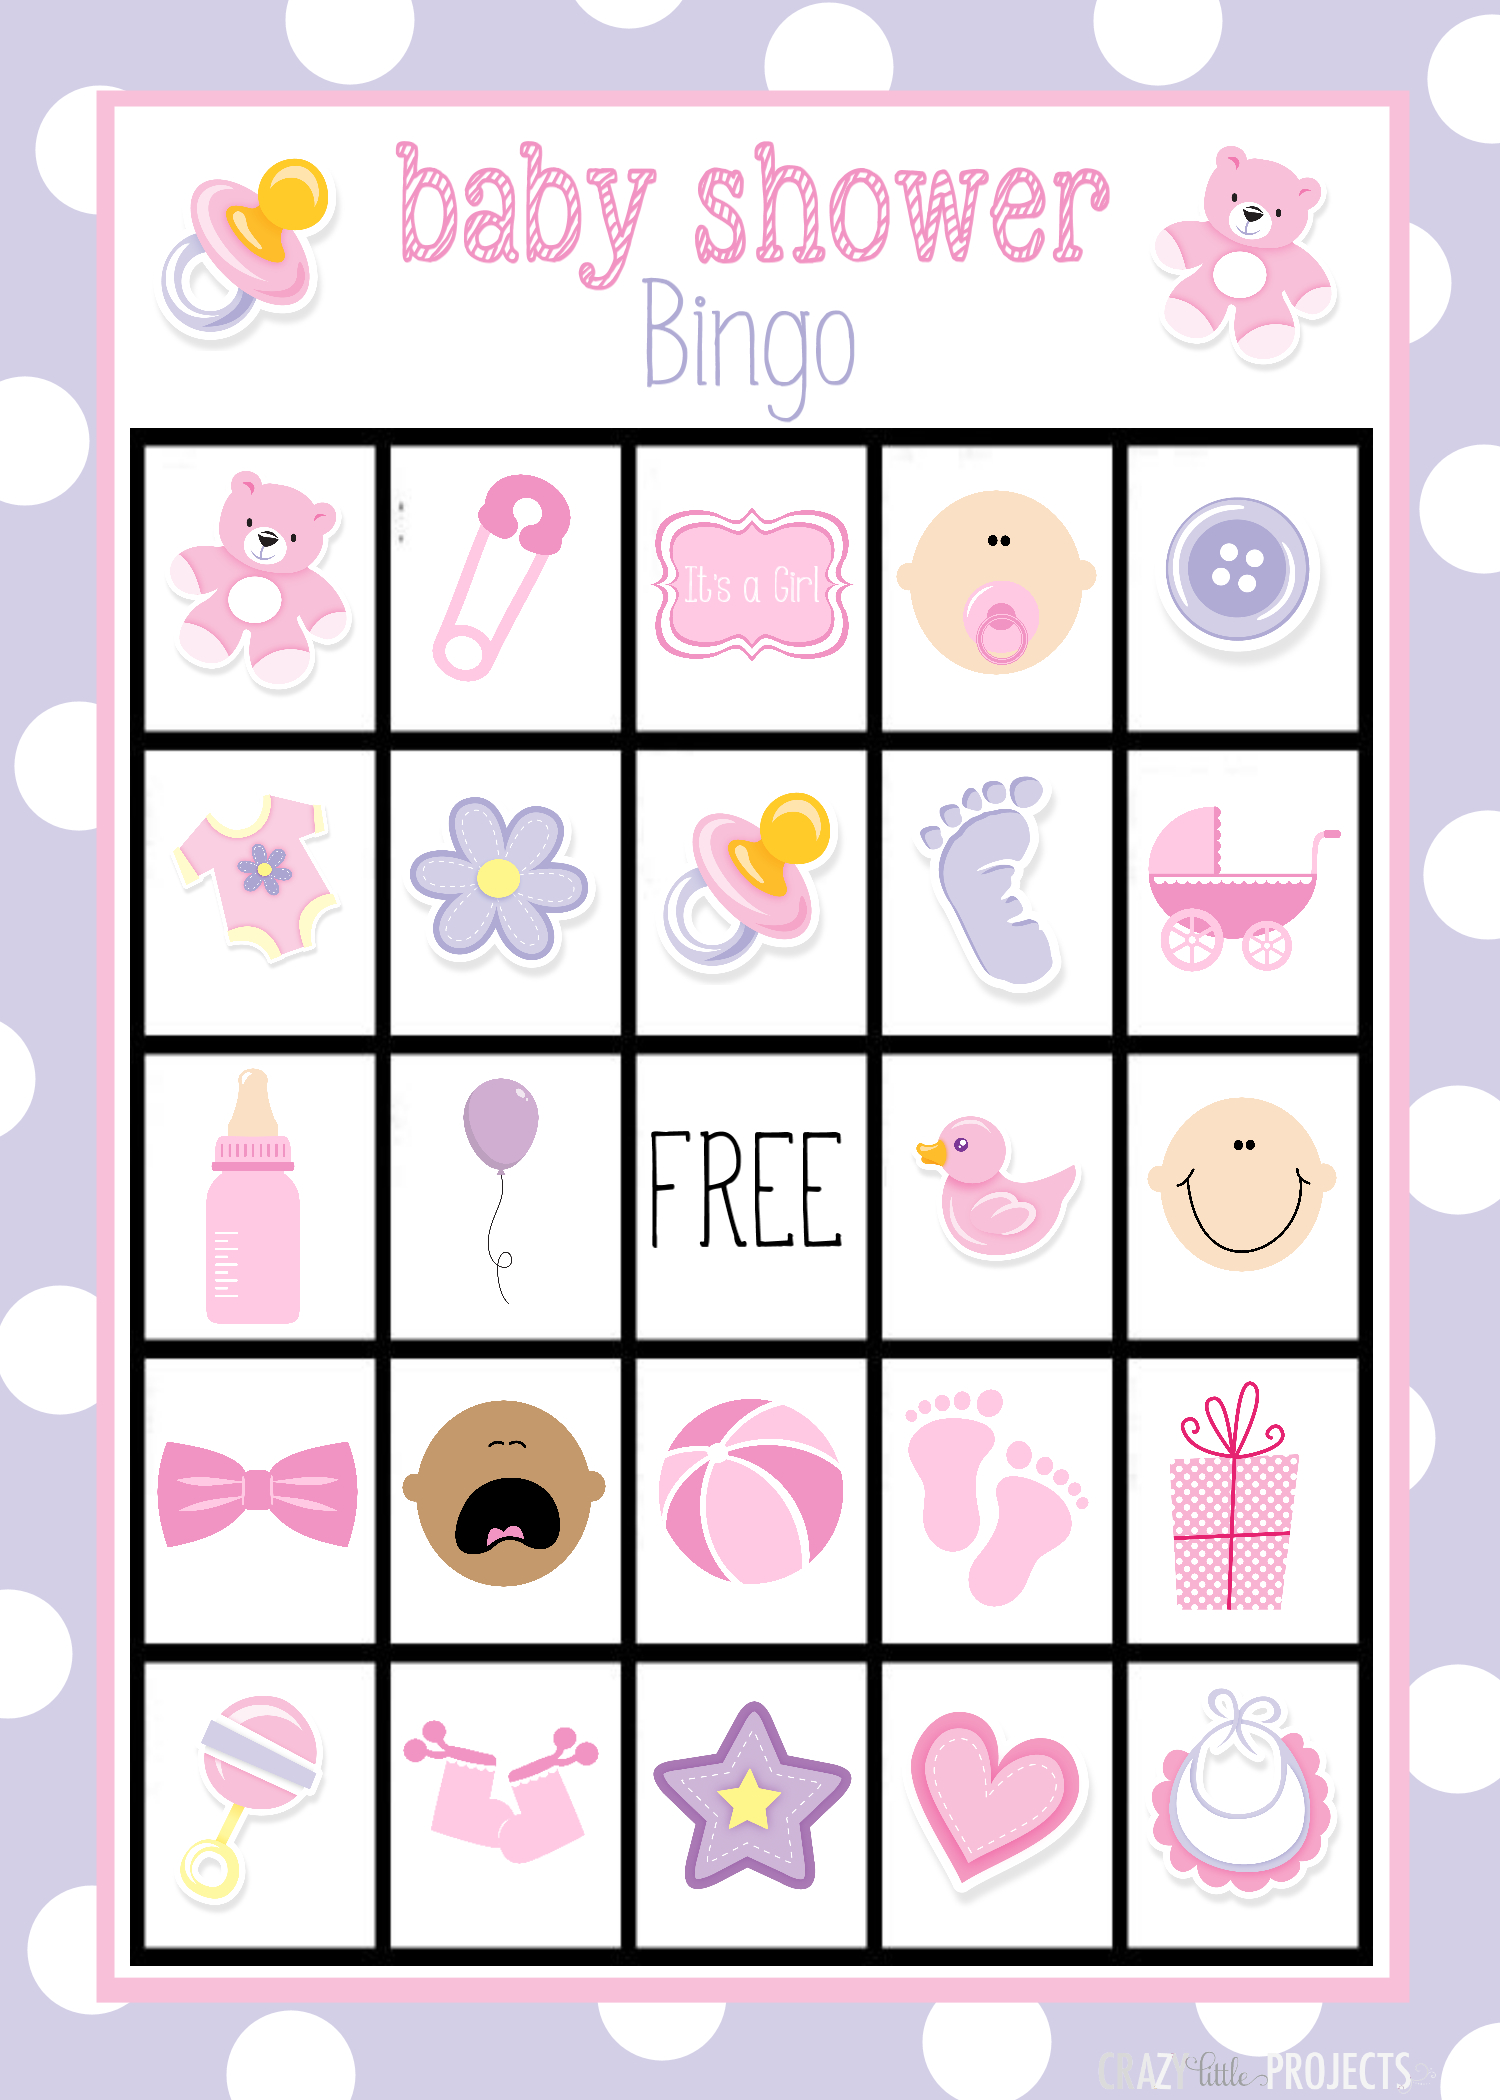 Baby Shower Bingo Cards - Baby Bingo Free Printable